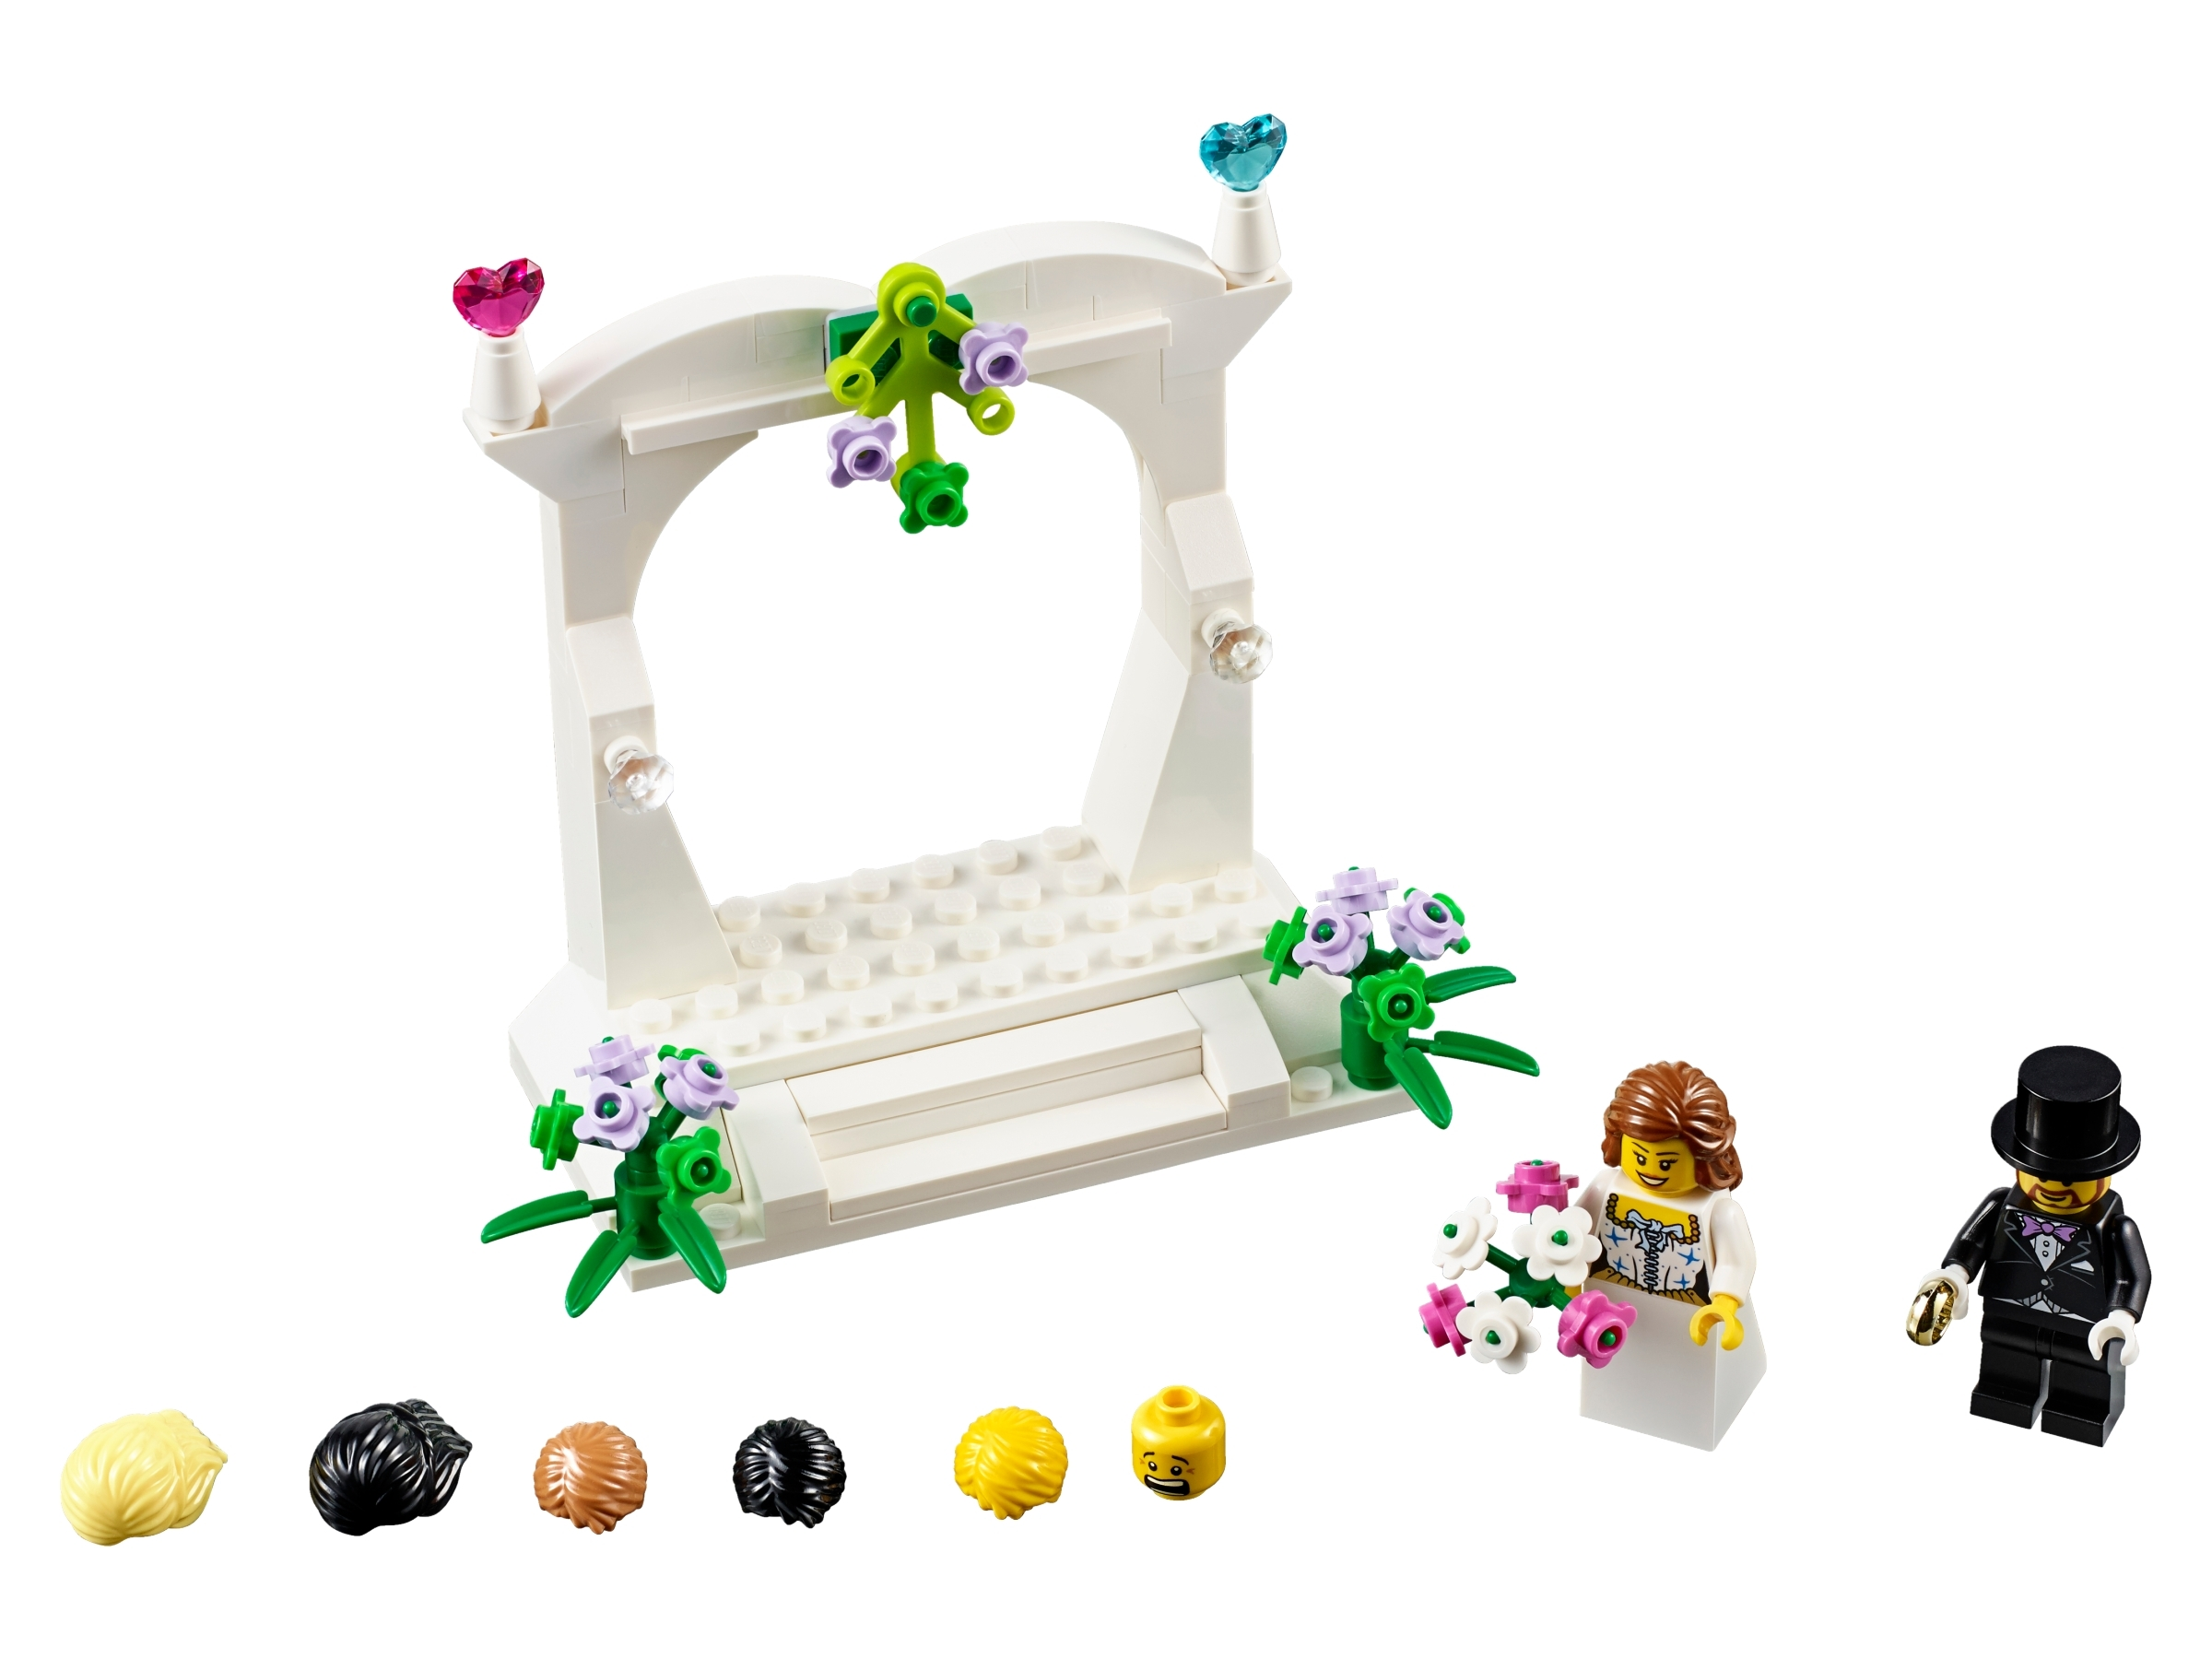 Lego 40165 Wedding Cake Topper Favor Set Bride /& Groom Minifigs 2016 NEW